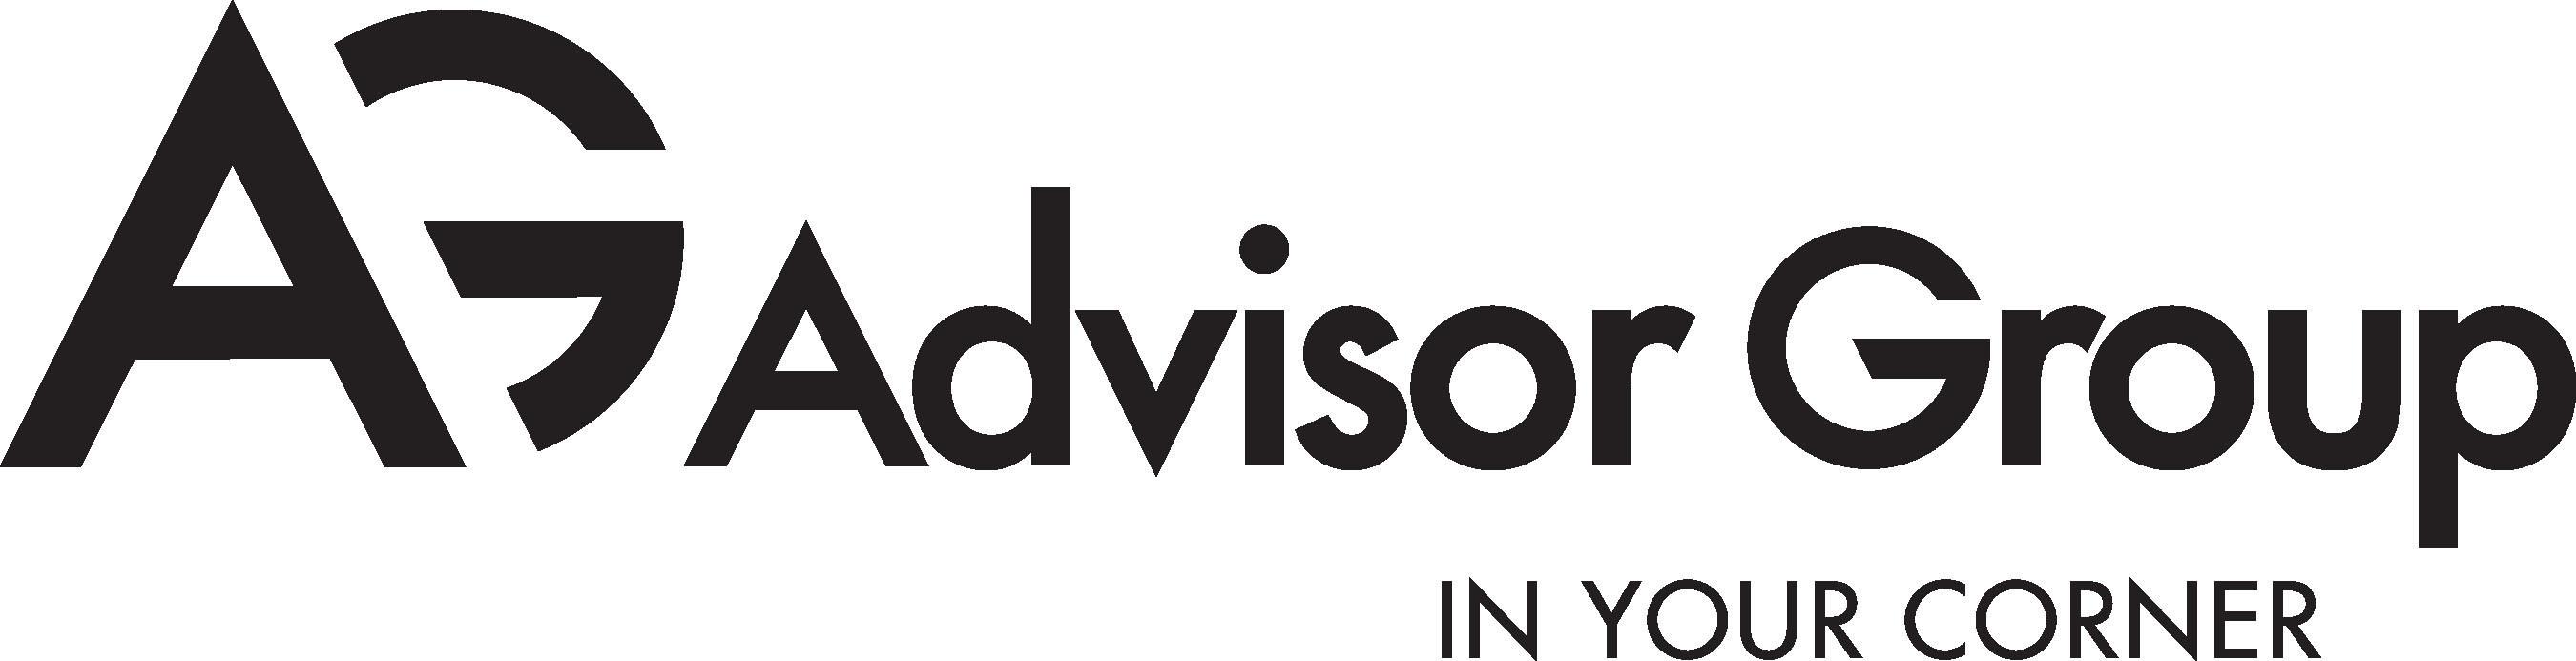 Advisor Group Inc. (PRNewsfoto/Advisor Group, Inc.)